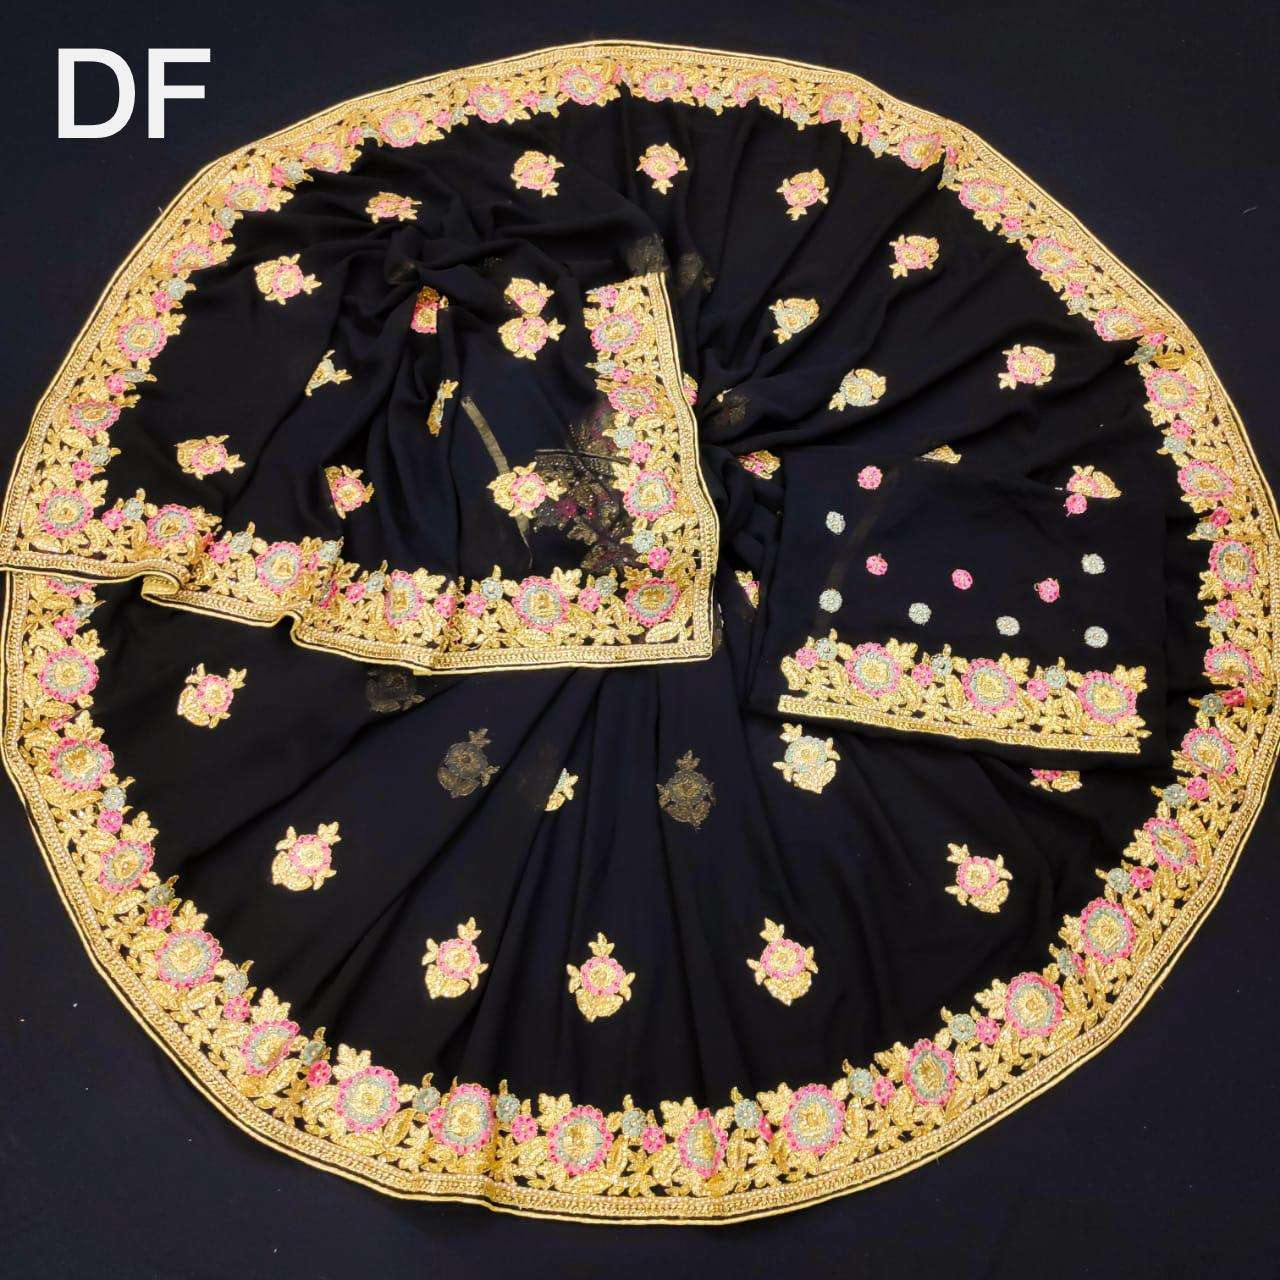 Df 4024 Vichitra Silk Georgette With Multi Embroidery Zari Work Sarees Collection 02